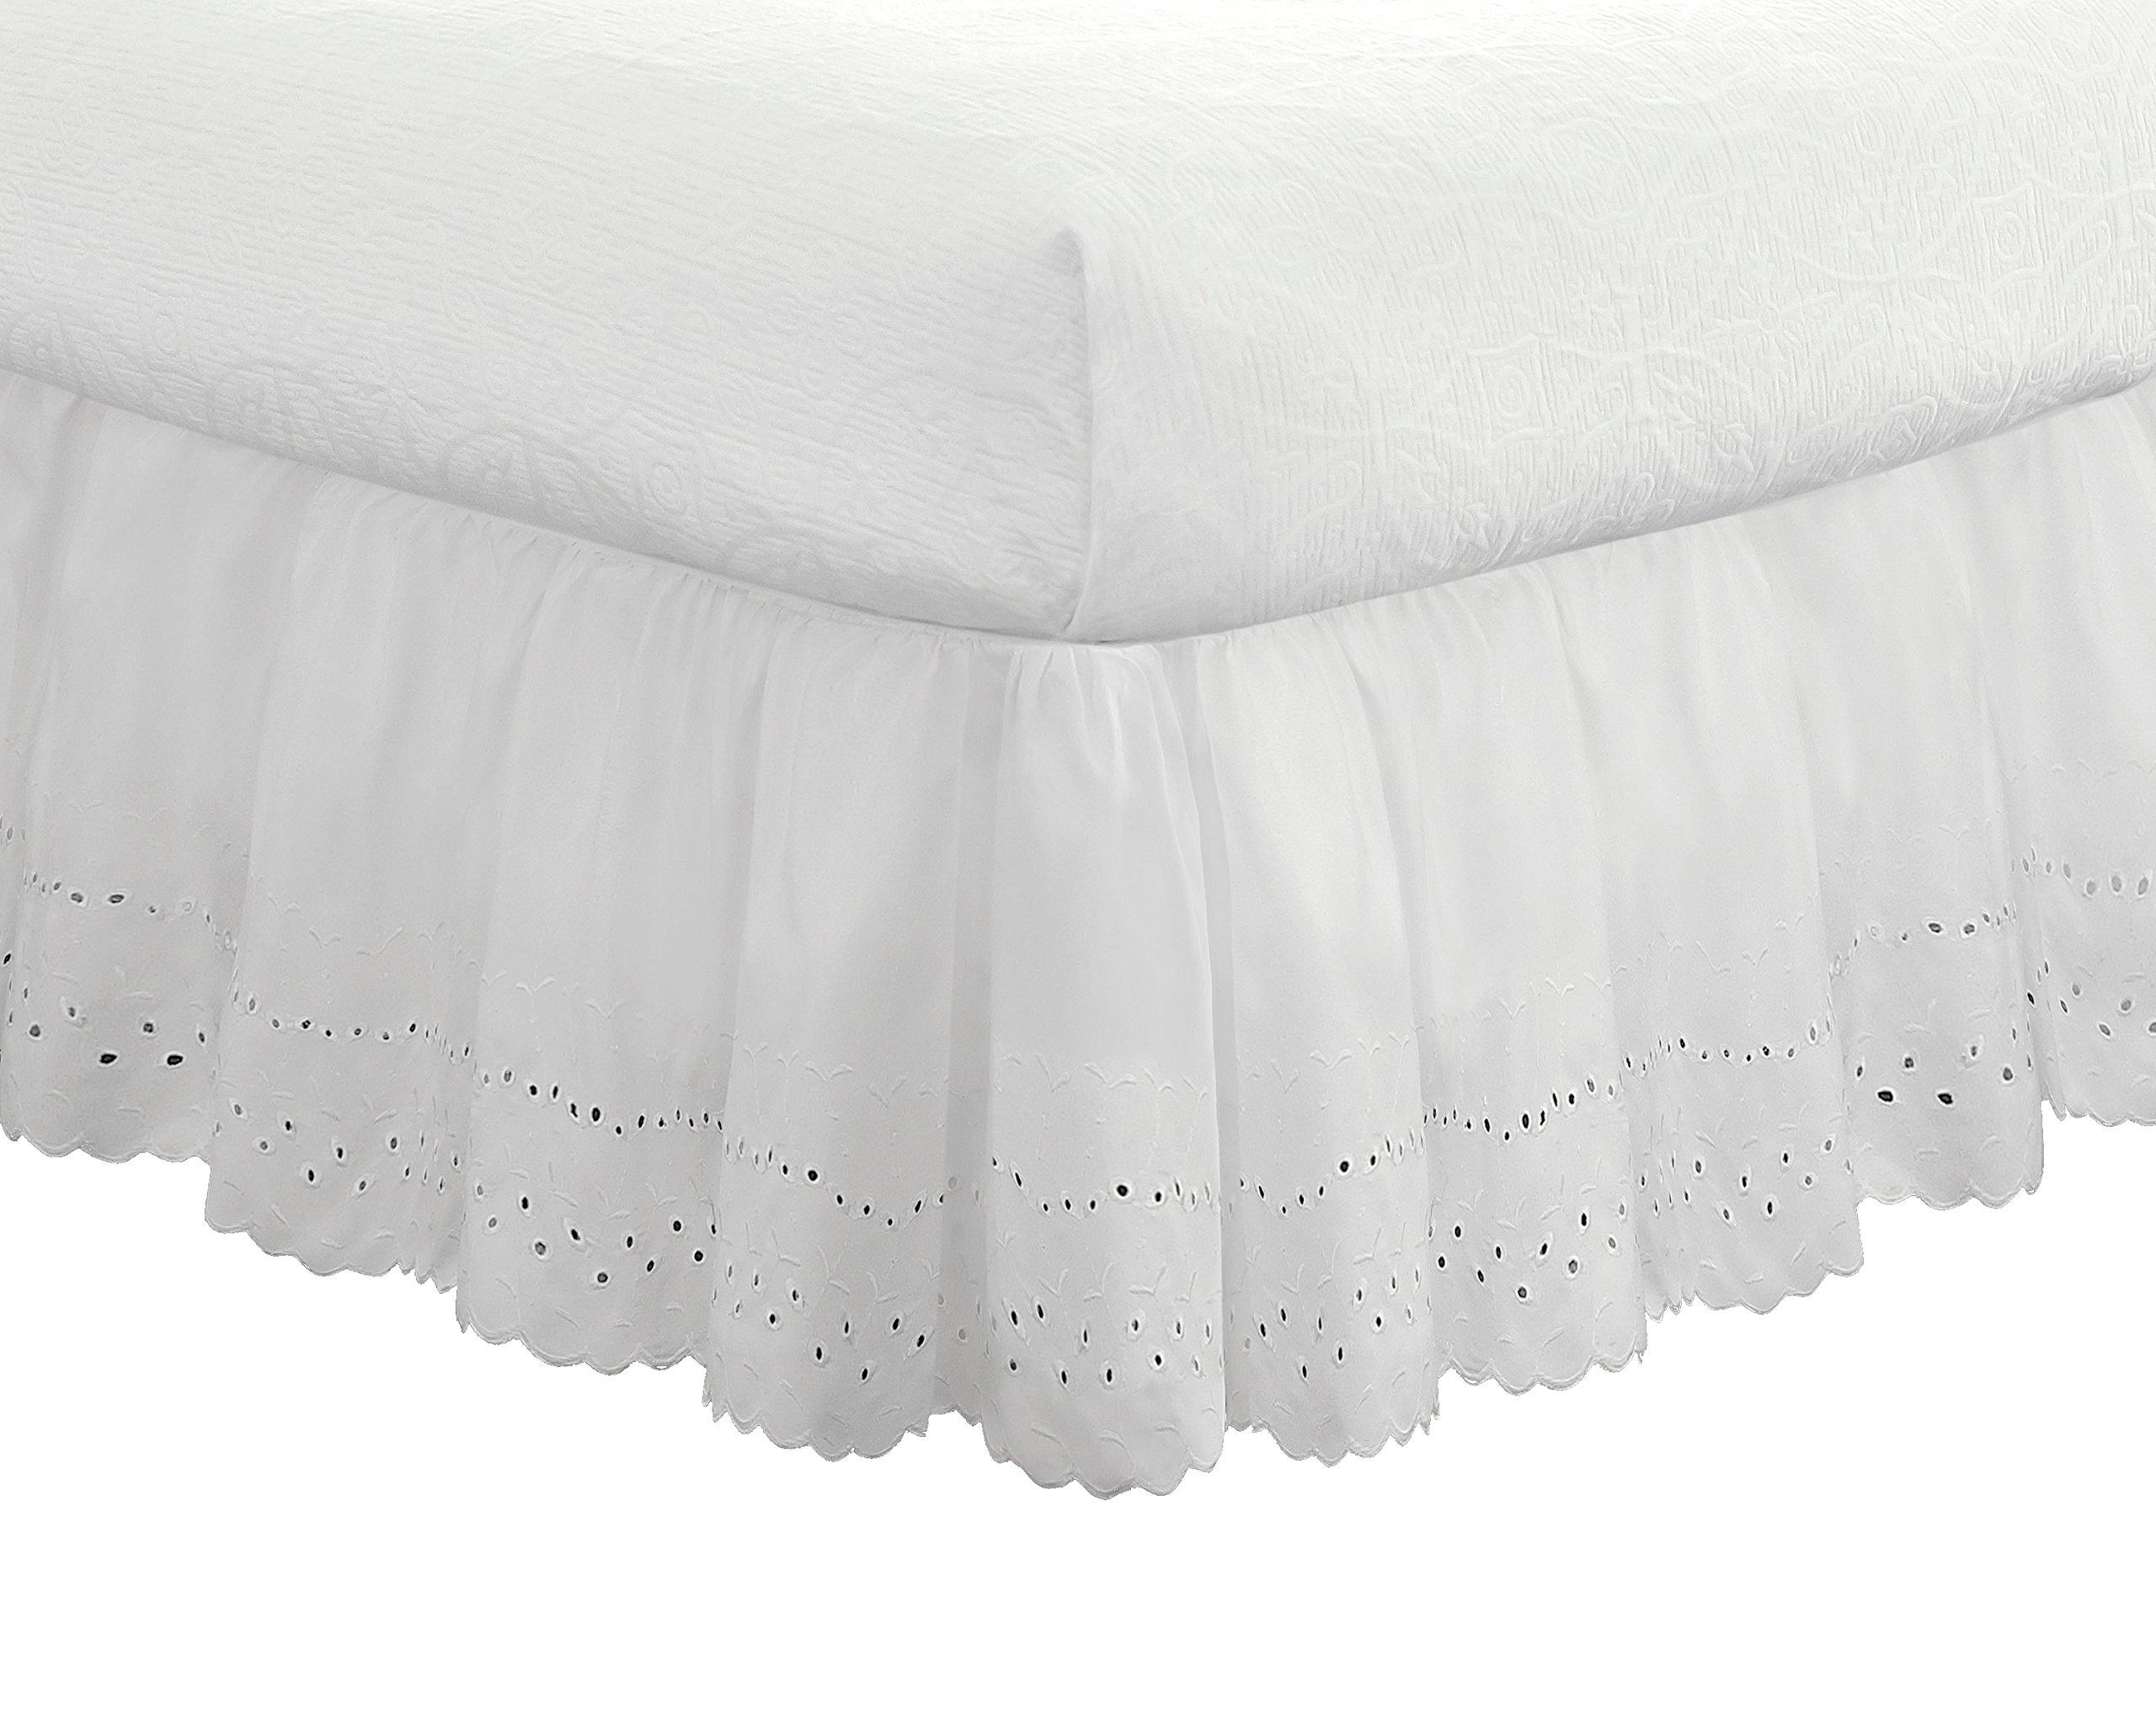 Eyelet Ruffled Bedskirt - Ruffled Bedding with Gathered Styling -14'' Drop, King, White